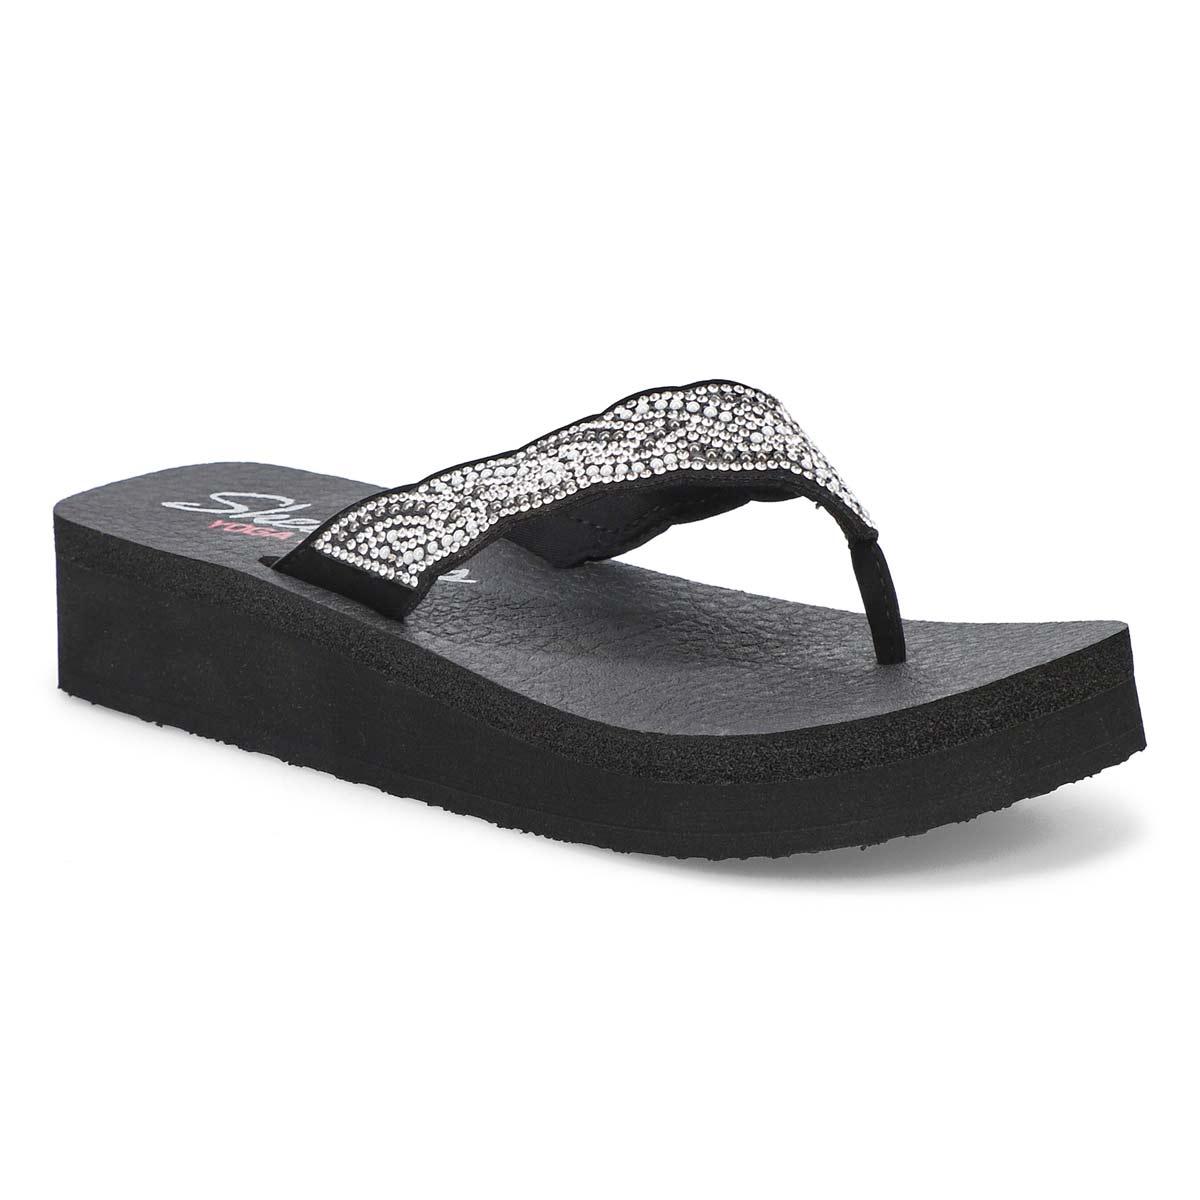 Women's Vinyassa Happy Pearl Sandal - Black